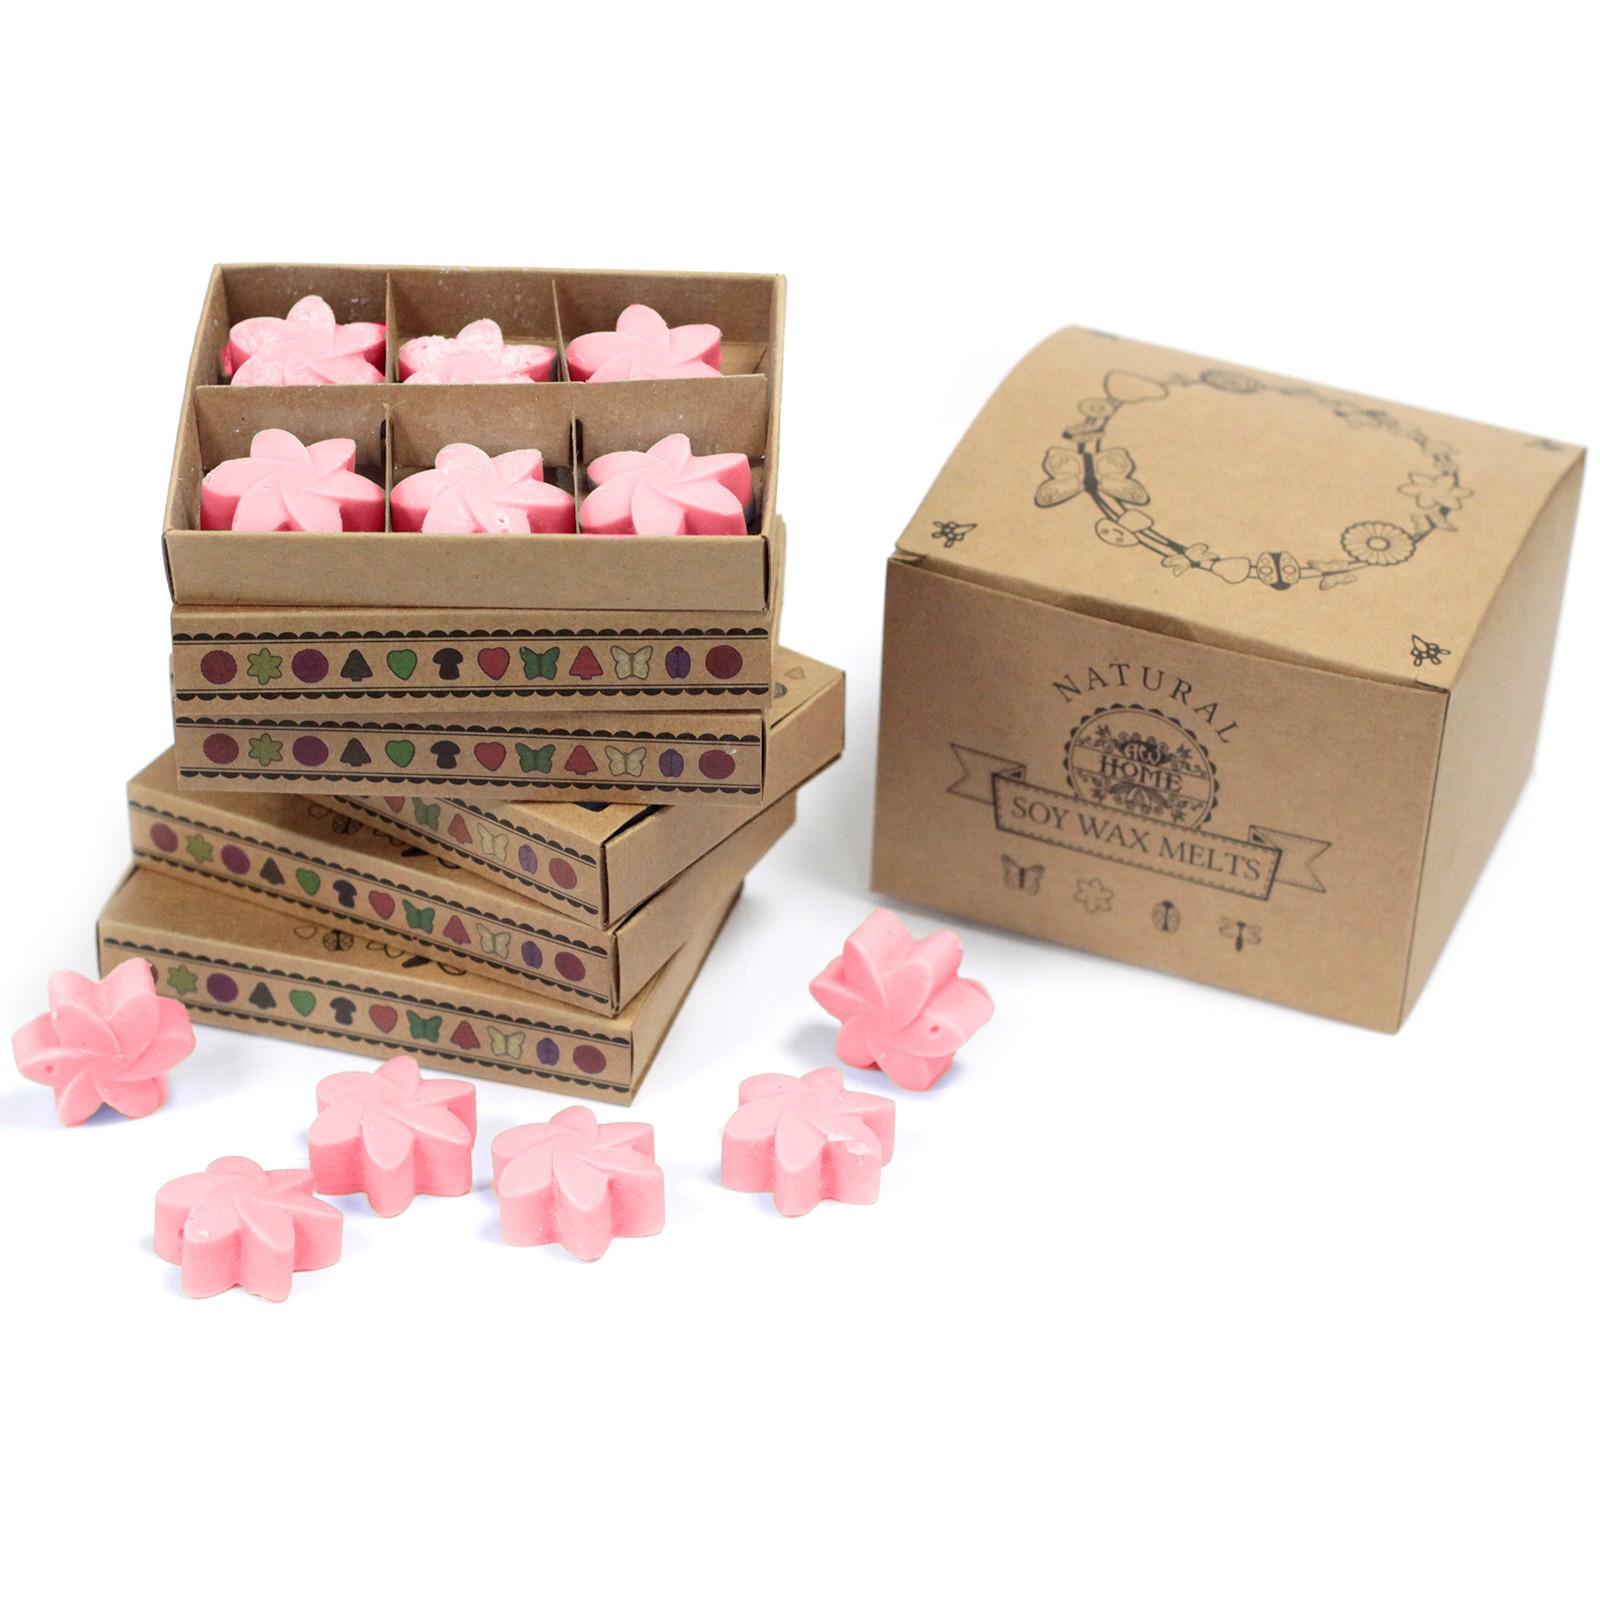 Box of 6 Wax Melts Classic Rose